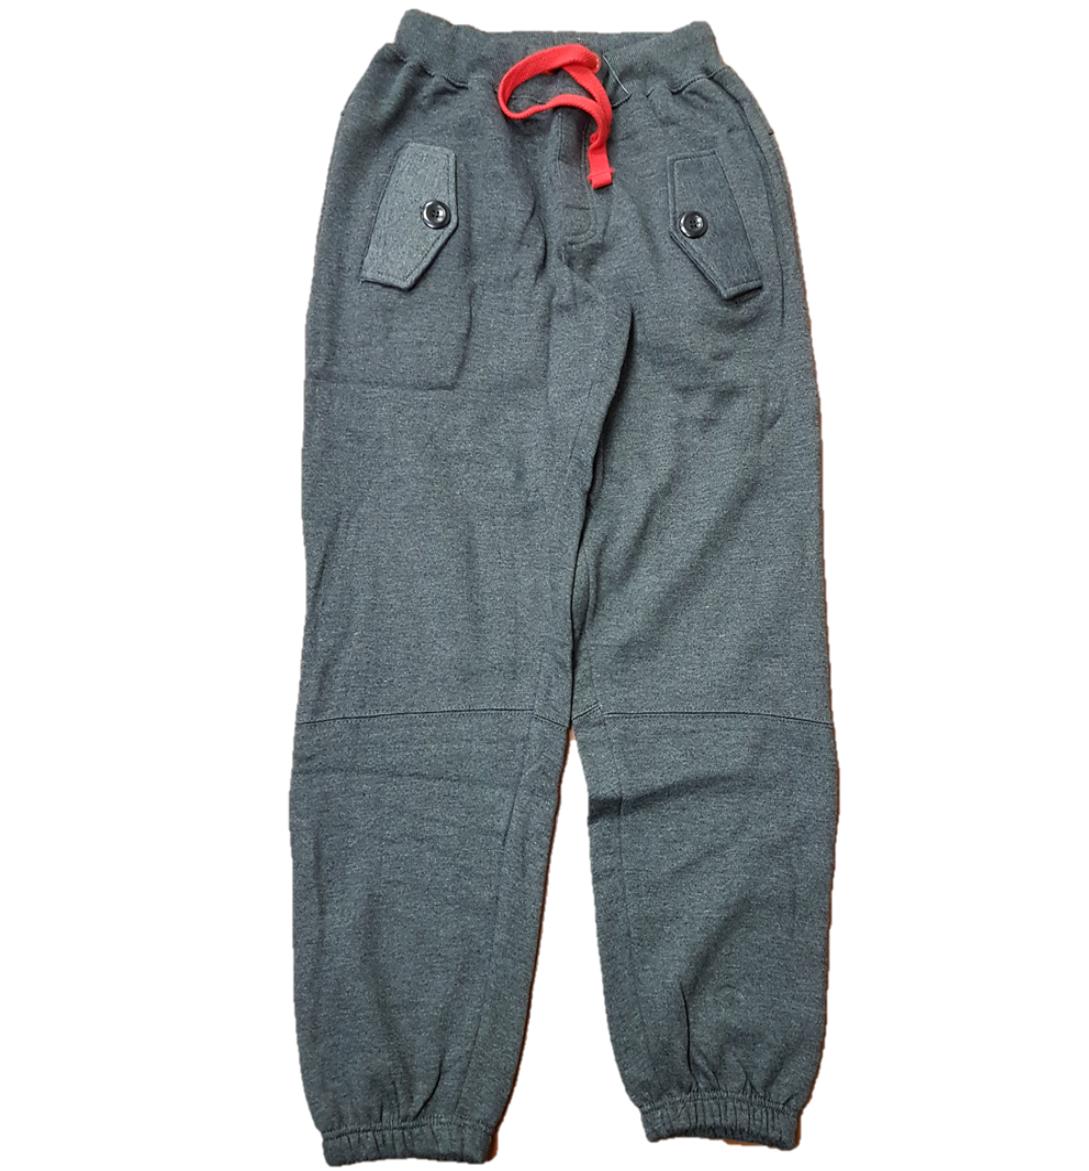 Mens Nova Hoody /& Joggers Tracksuit Bottoms /& Top Winter Pullover Cuffed Pants